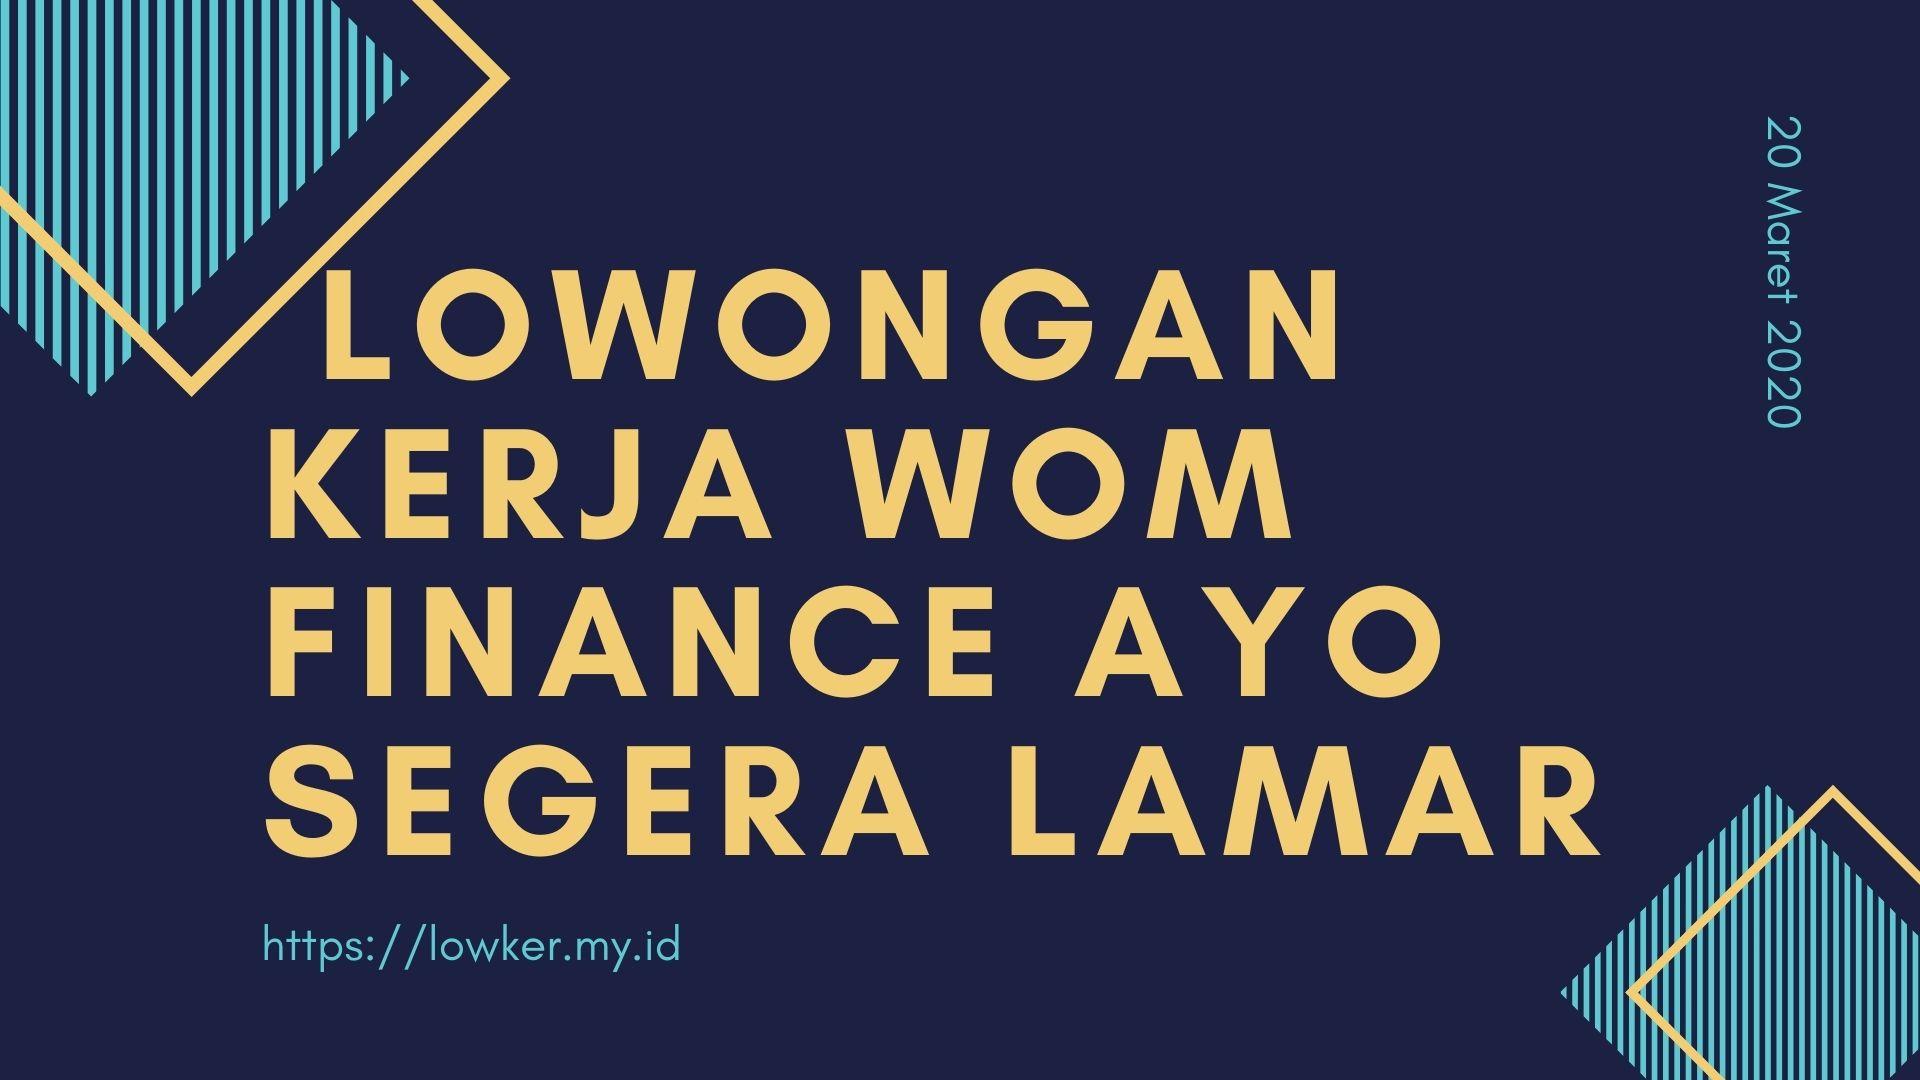 LOWONGAN KERJA WOM FINANCE AYO SEGERA LAMAR